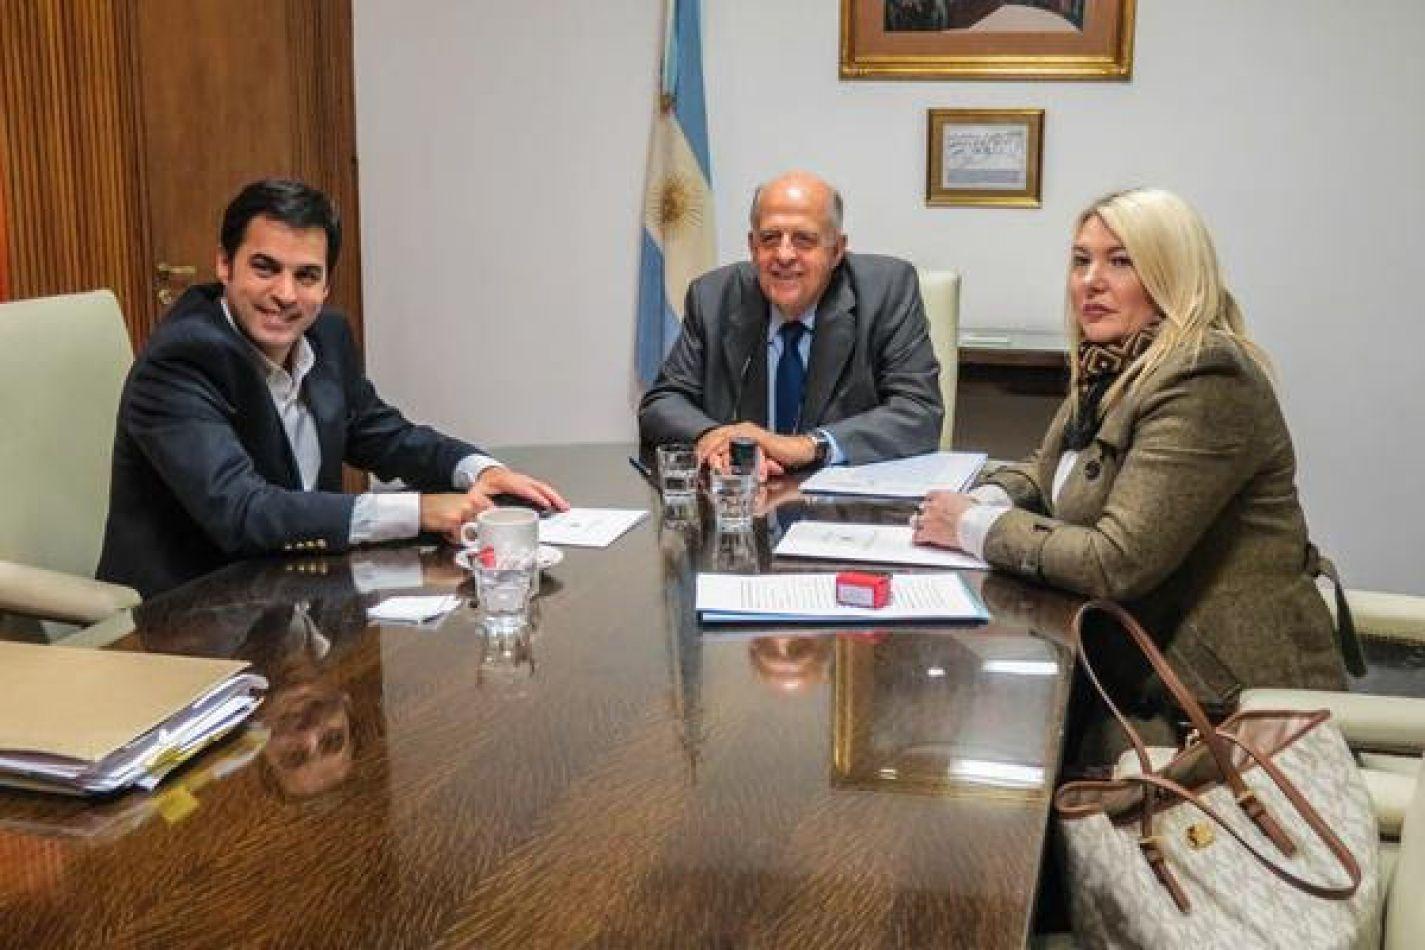 La gobernadora Rosana Bertone regularizó el viernes la titularidad de un terreno del Estado nacional